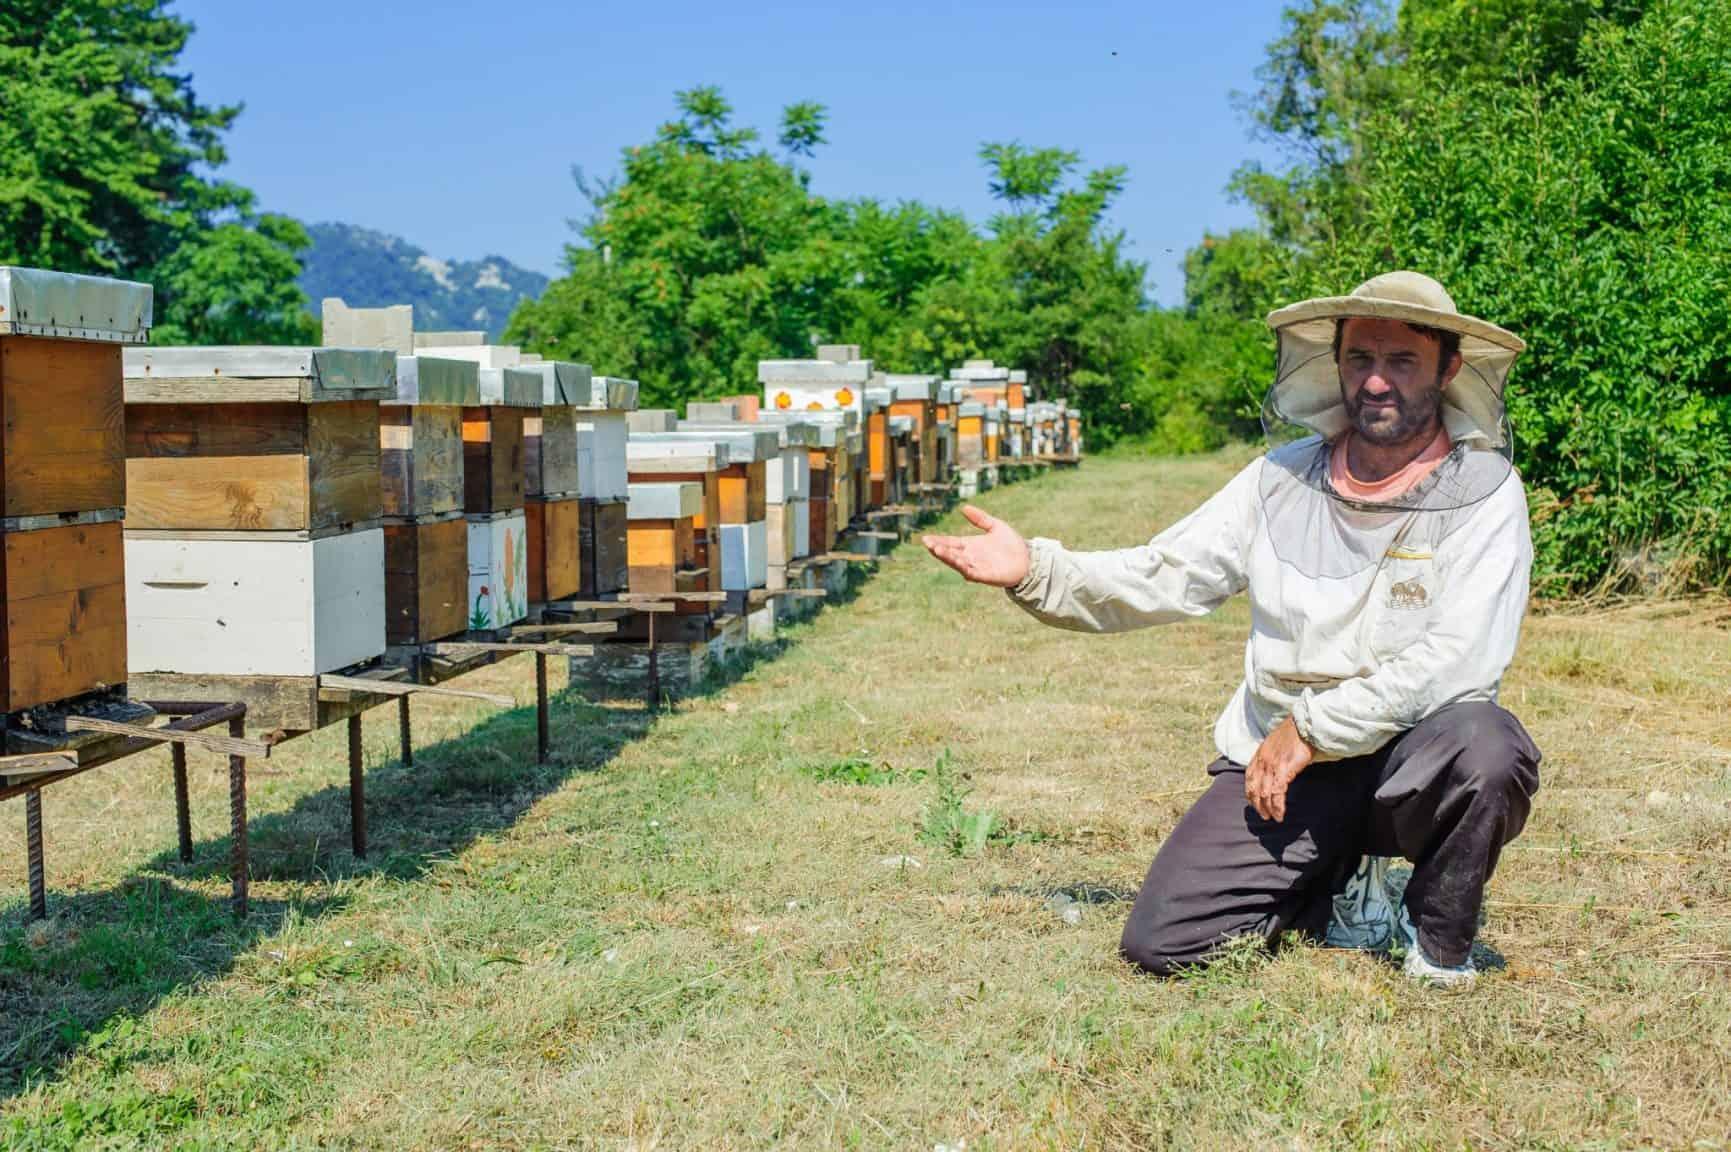 Beehive location